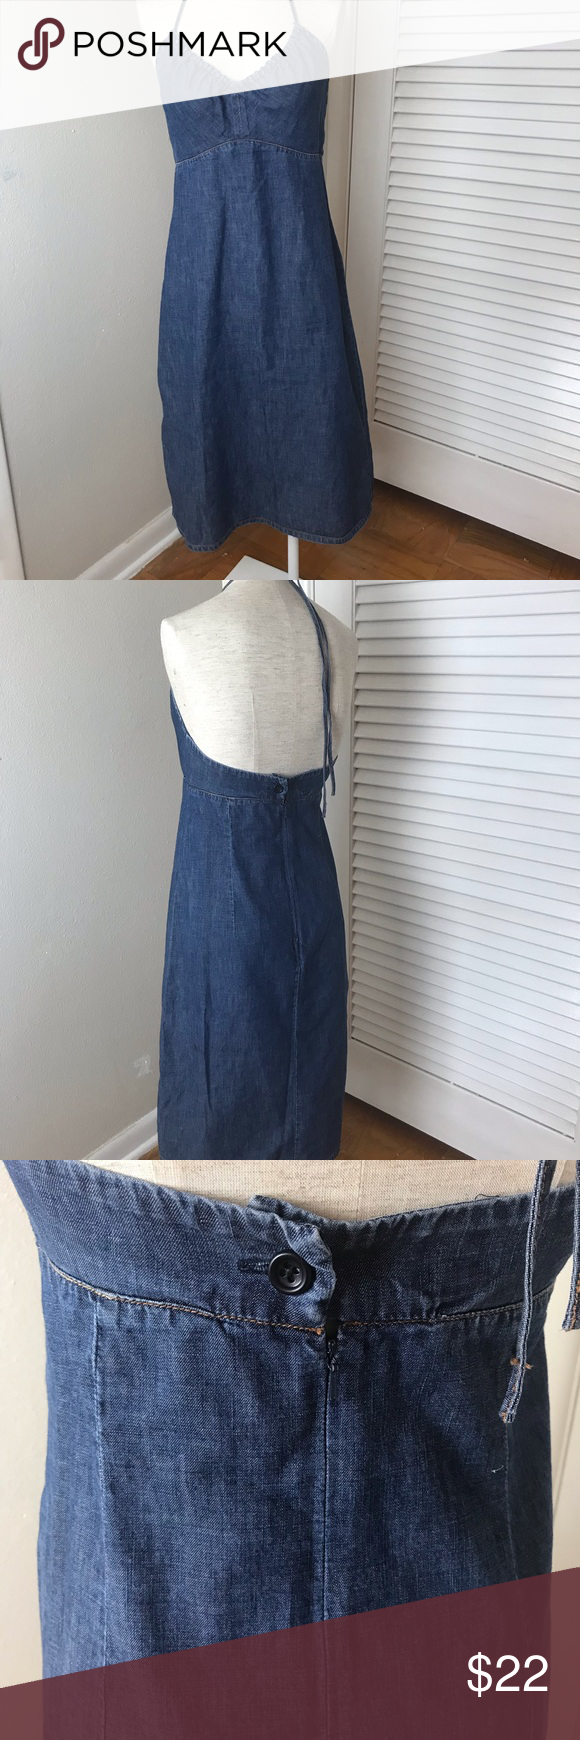 3ada04787e Gap Denim halter dress Gap Denim halter dress. This adorable dress perfect  for the summer